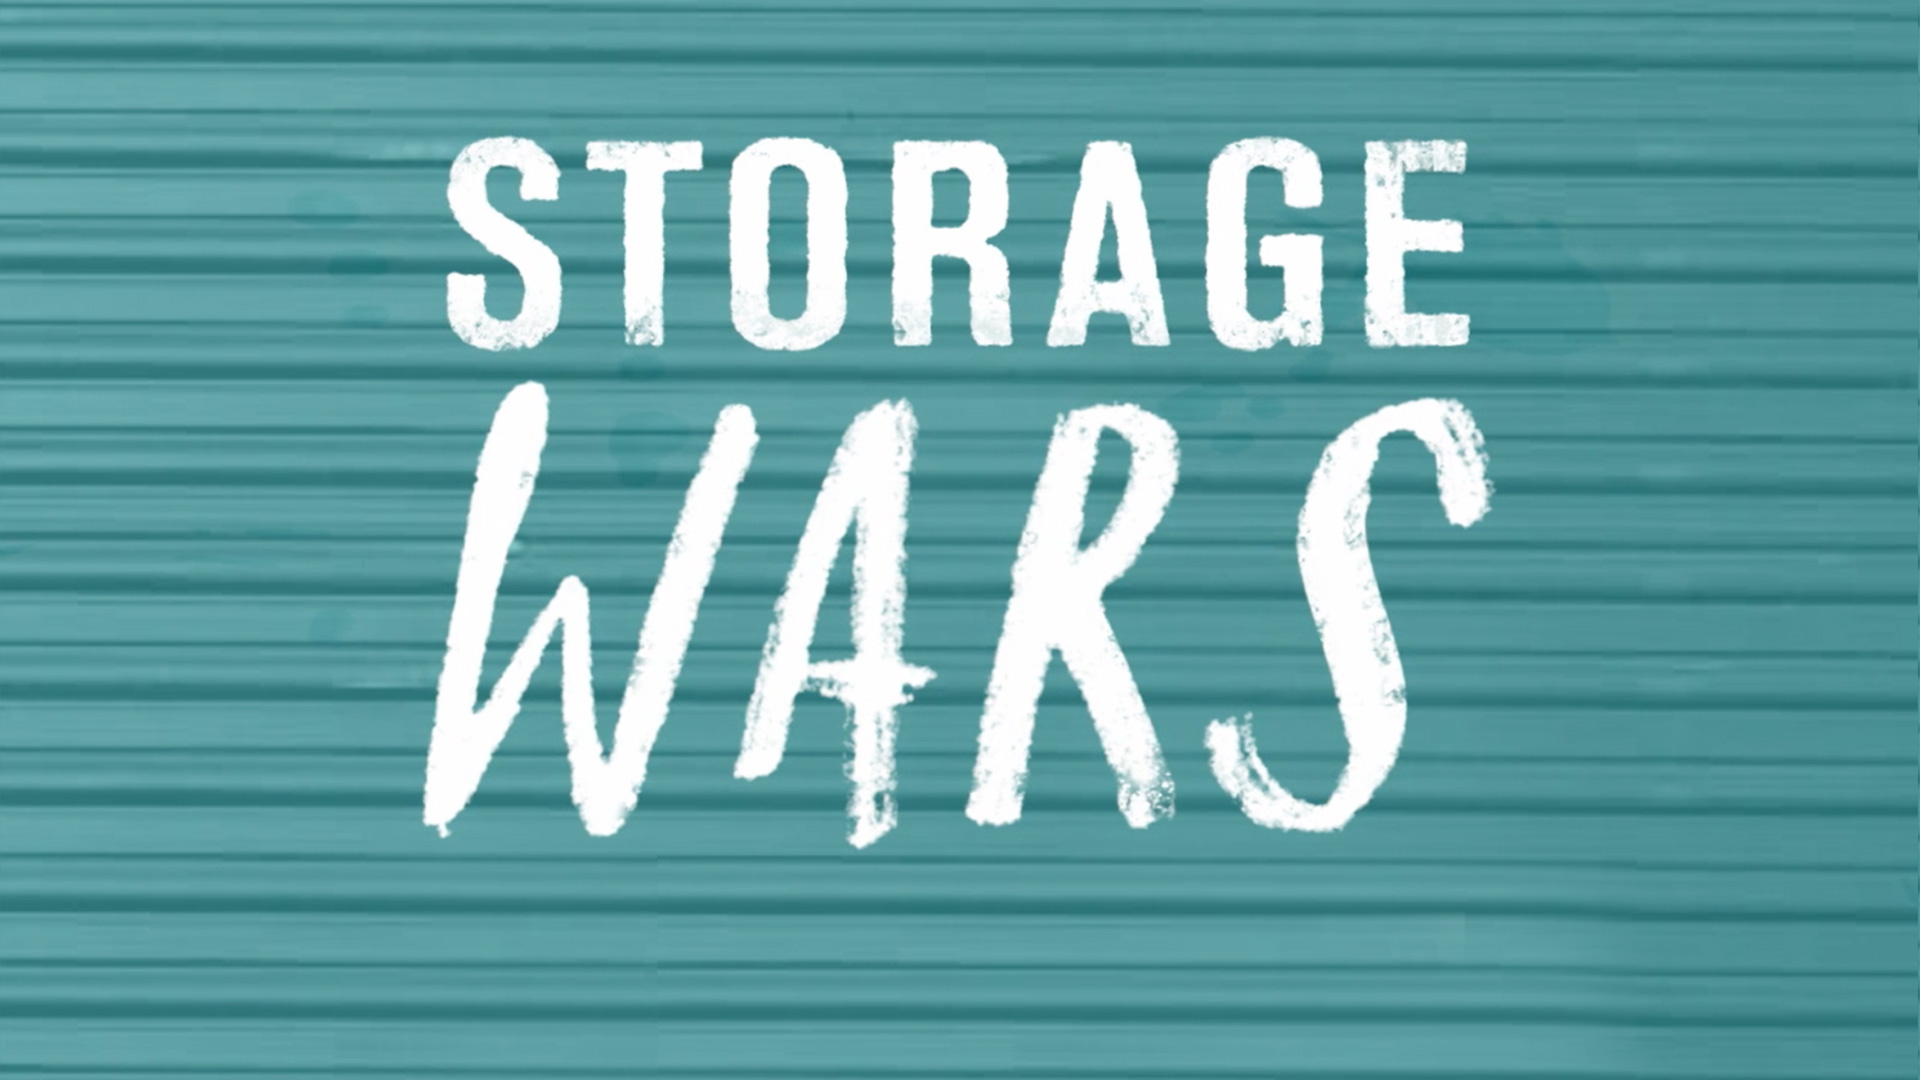 Storage Wars Full Episodes, Video & More | A&E